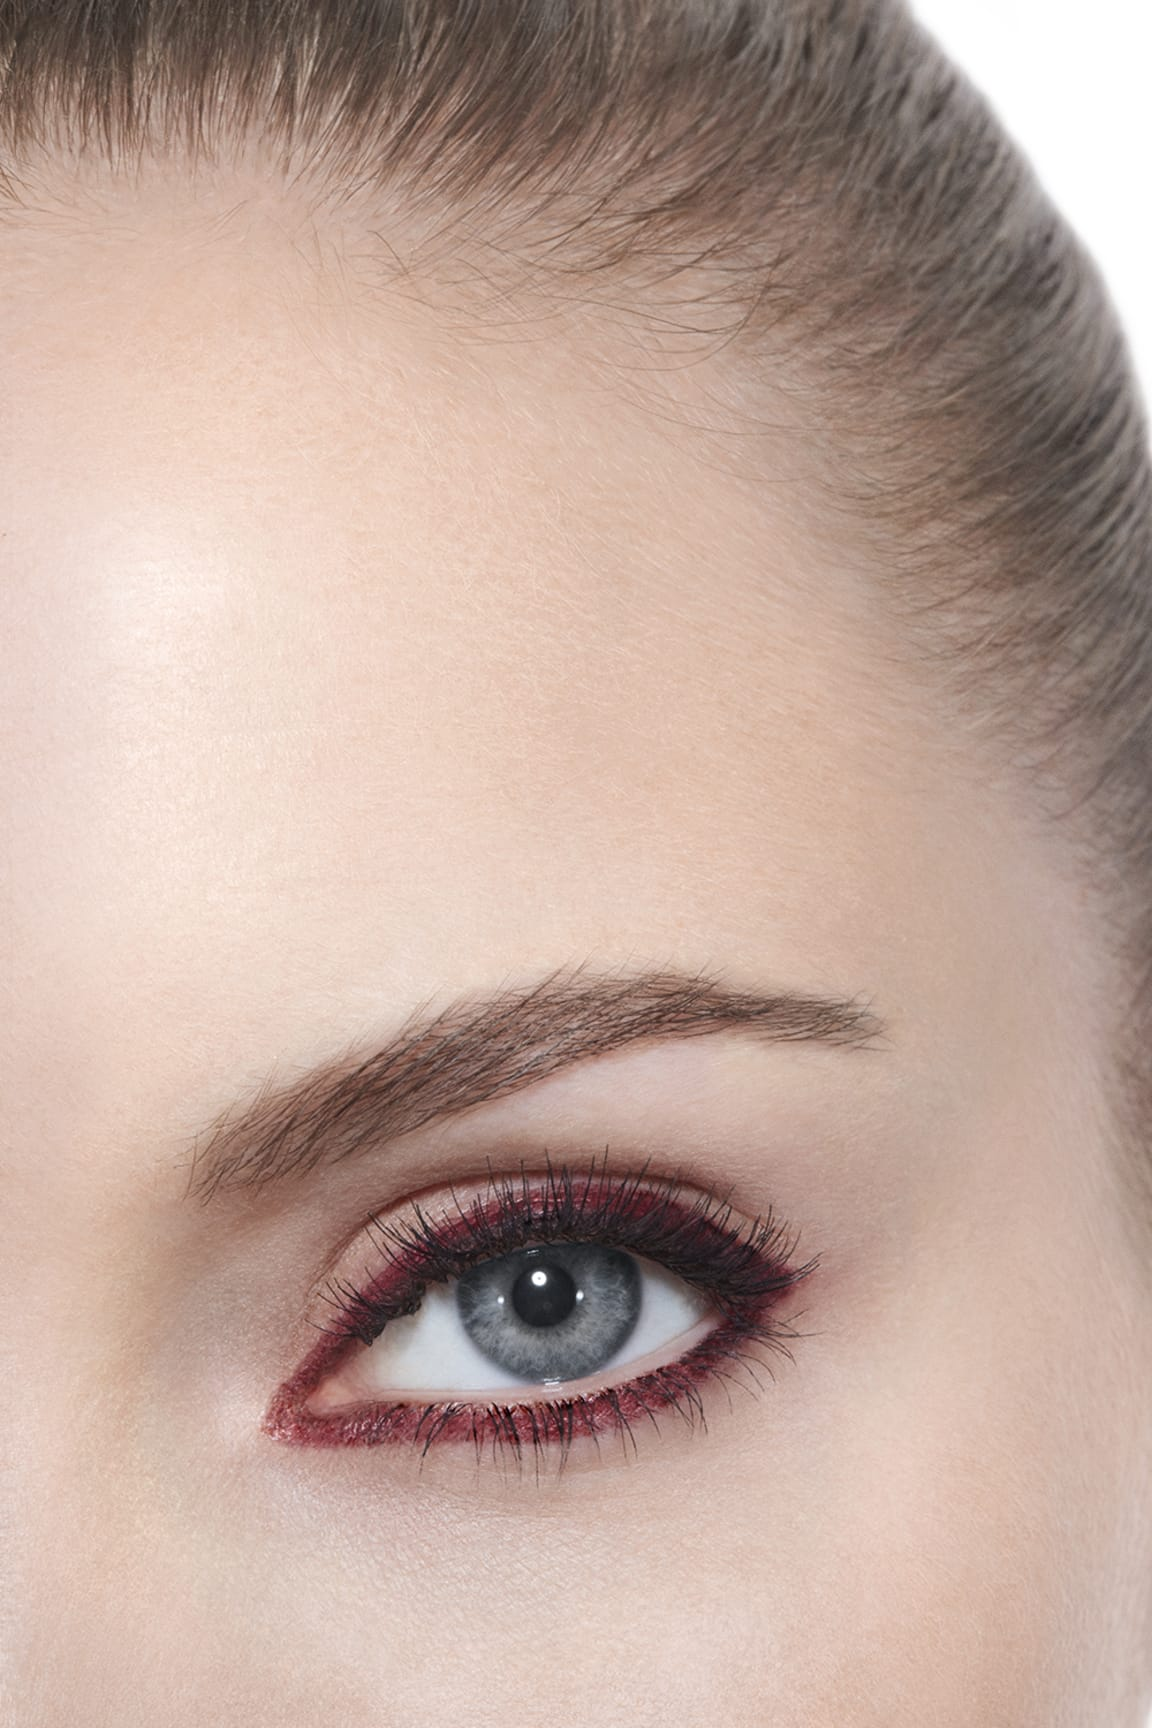 Application makeup visual 3 - STYLO YEUX WATERPROOF 928 - EROS